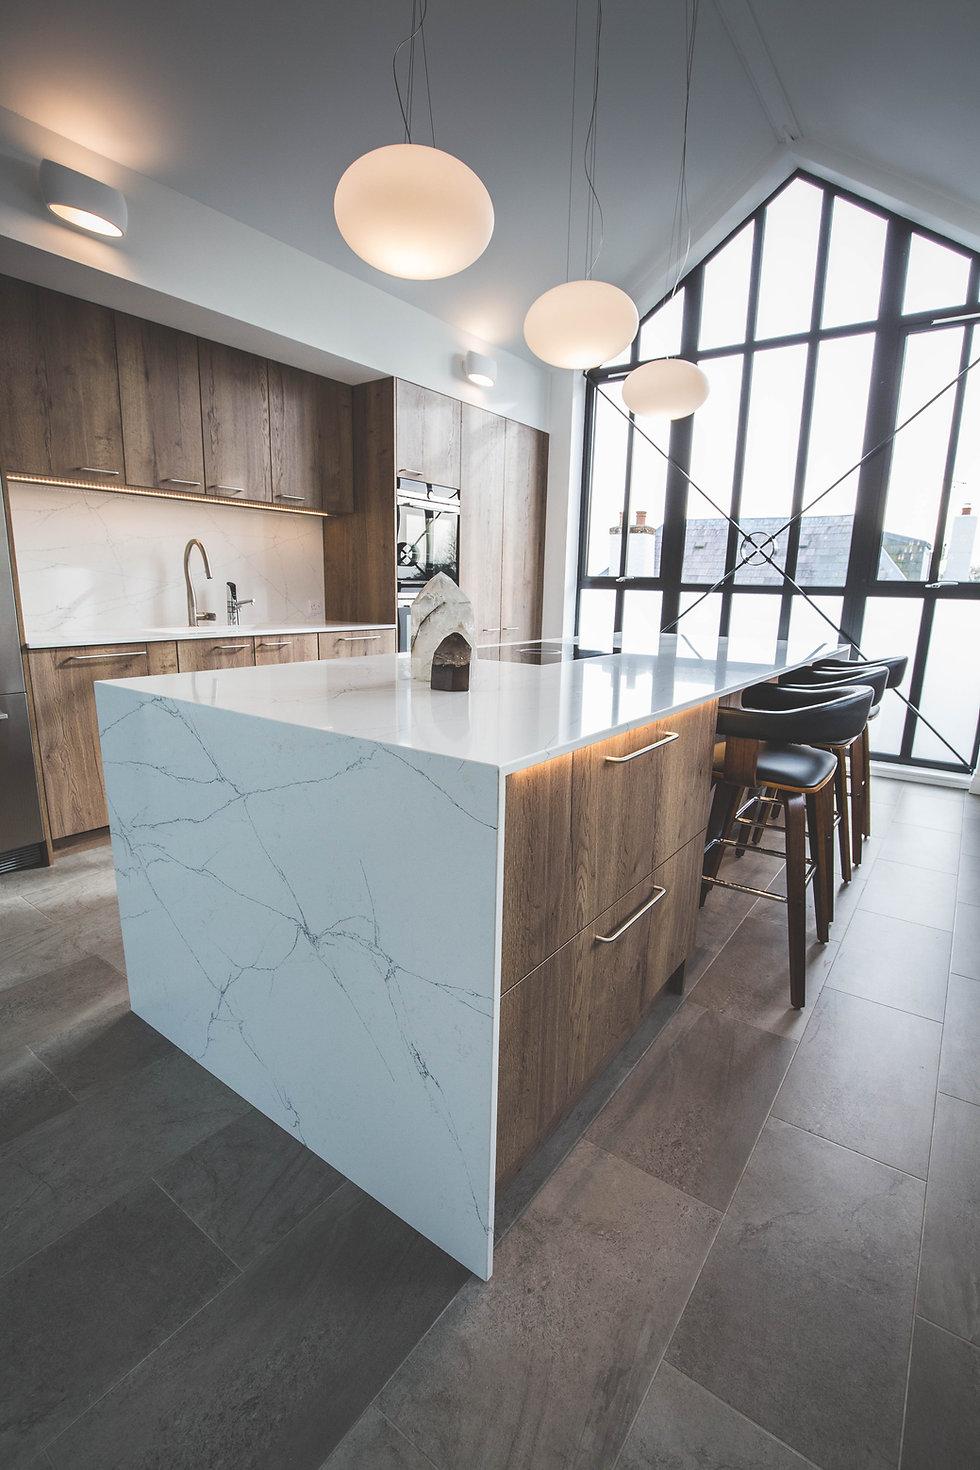 A modern industrial style kitchen